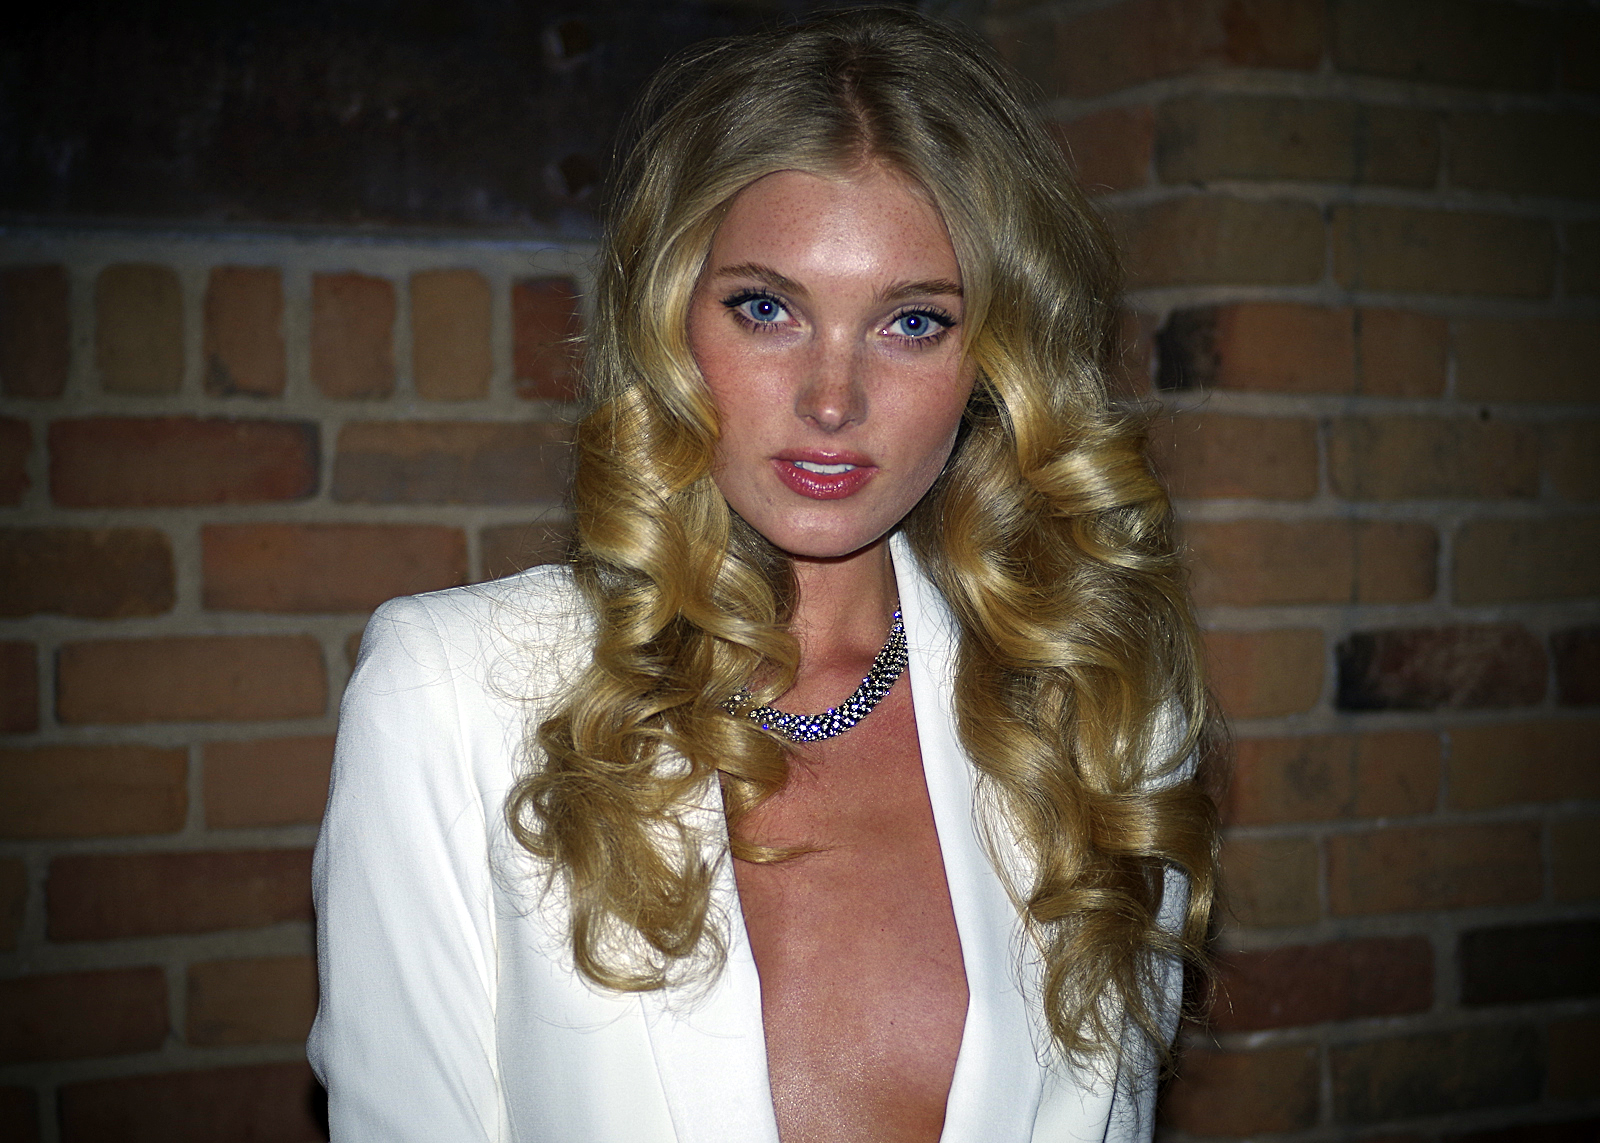 Elsa Anna Hosk